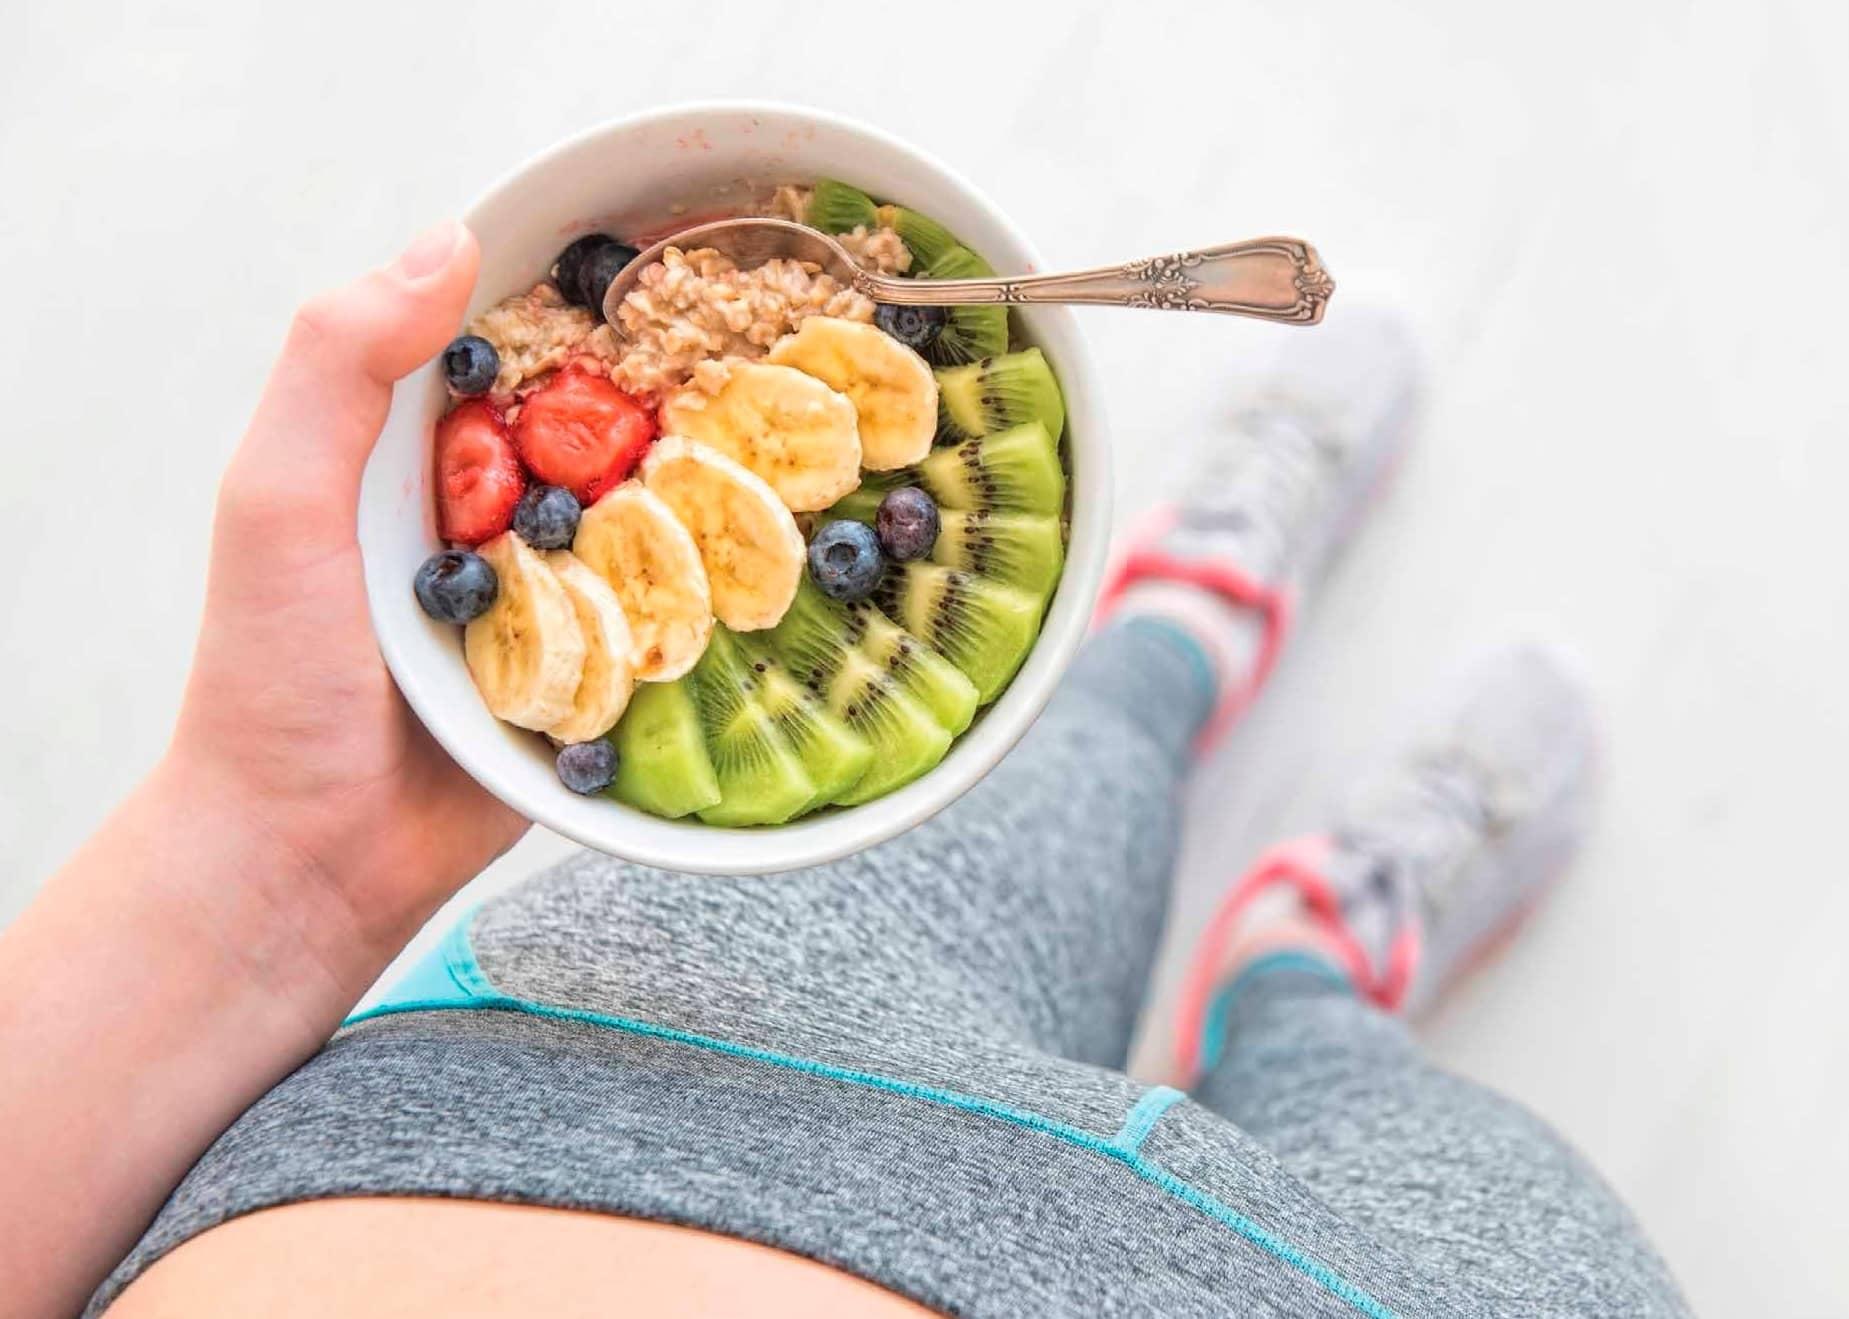 Un cuerpo sin lesiones – Parte 2 – Dieta Vs. lesiones